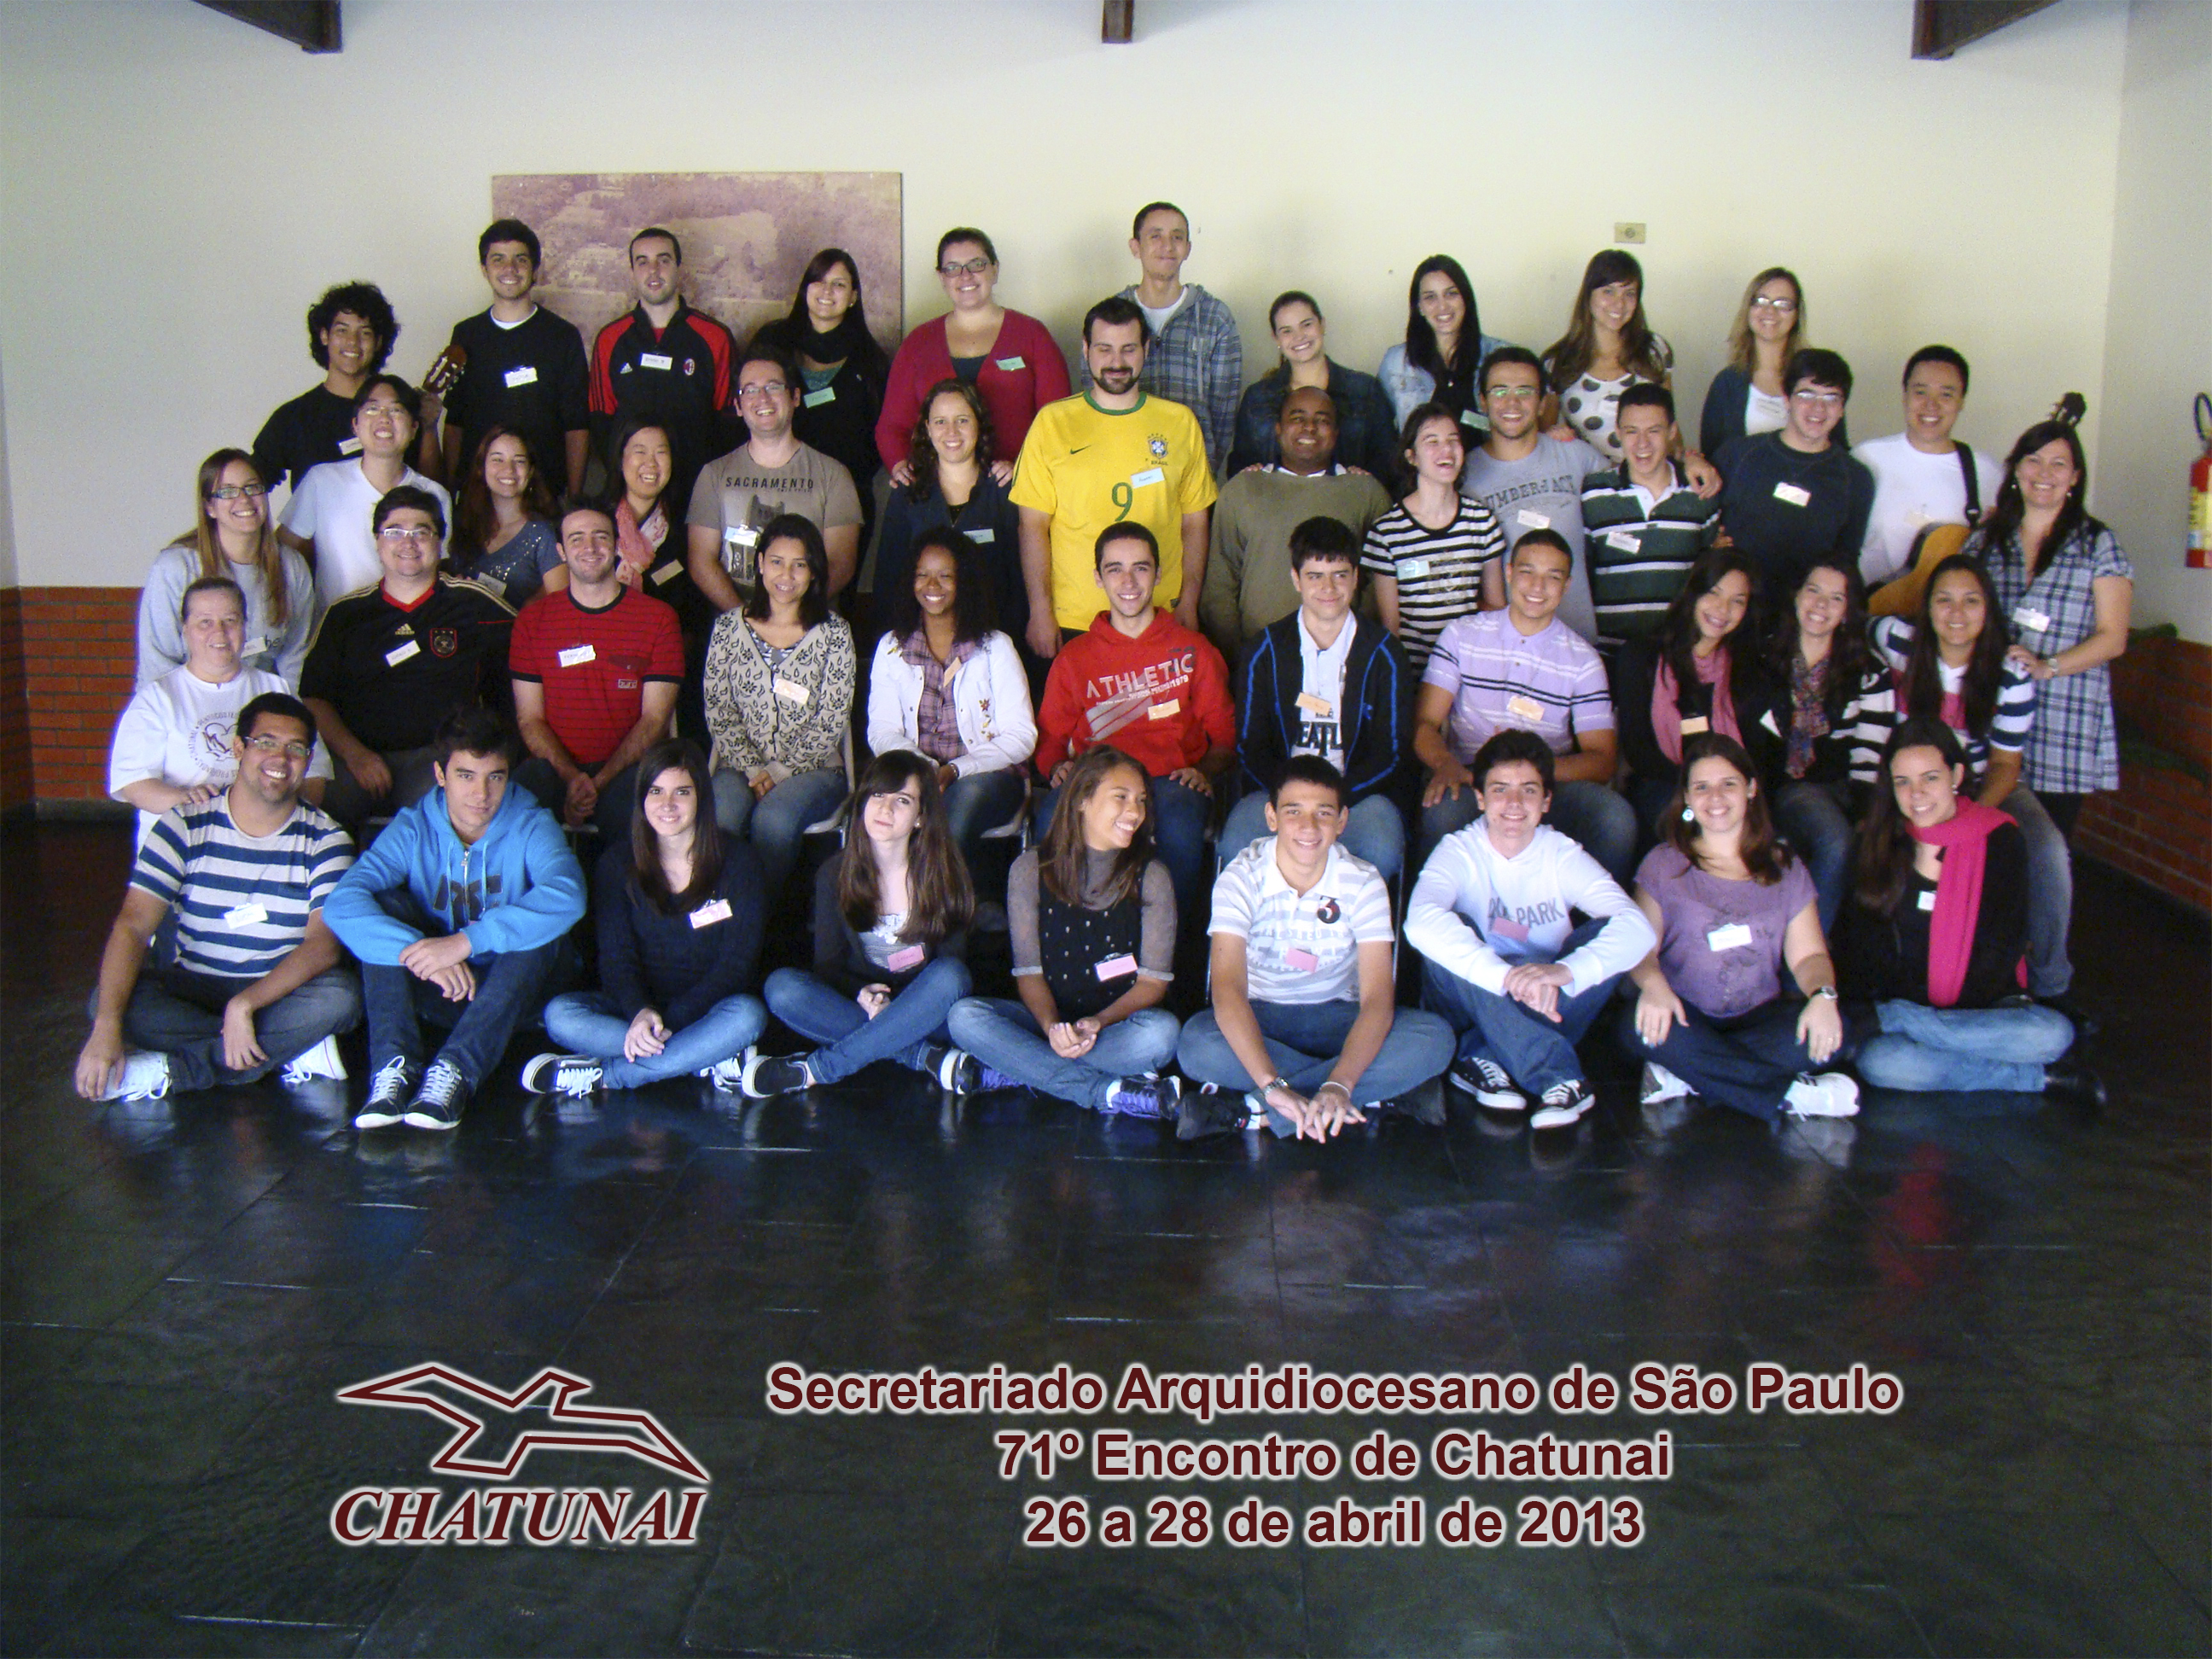 71º Chatunai